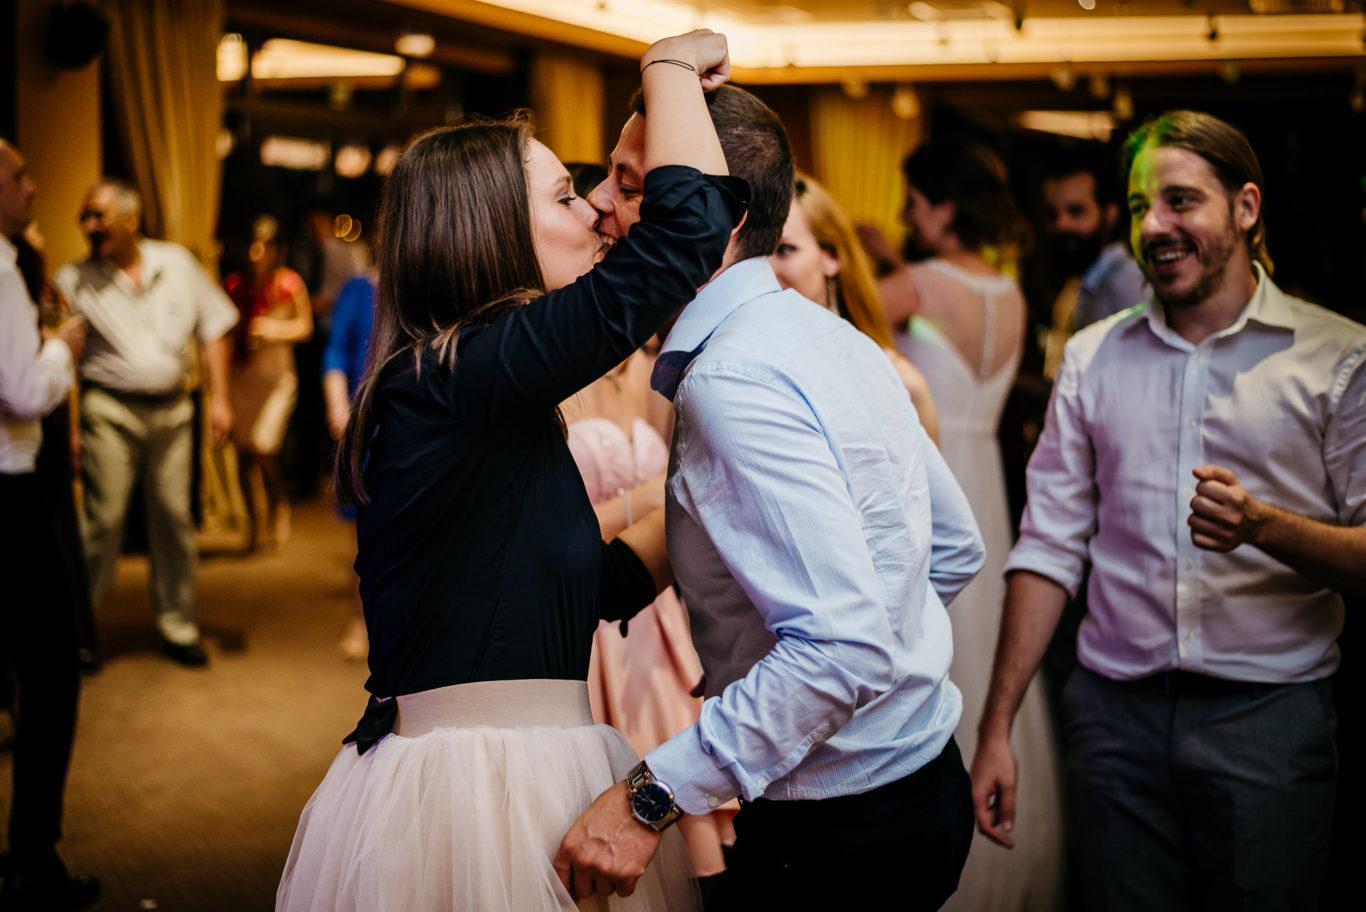 0761-Fotografie-nunta-Bucuresti-Oana-Catalin-fotograf-Ciprian-Dumitrescu-DSC_5338